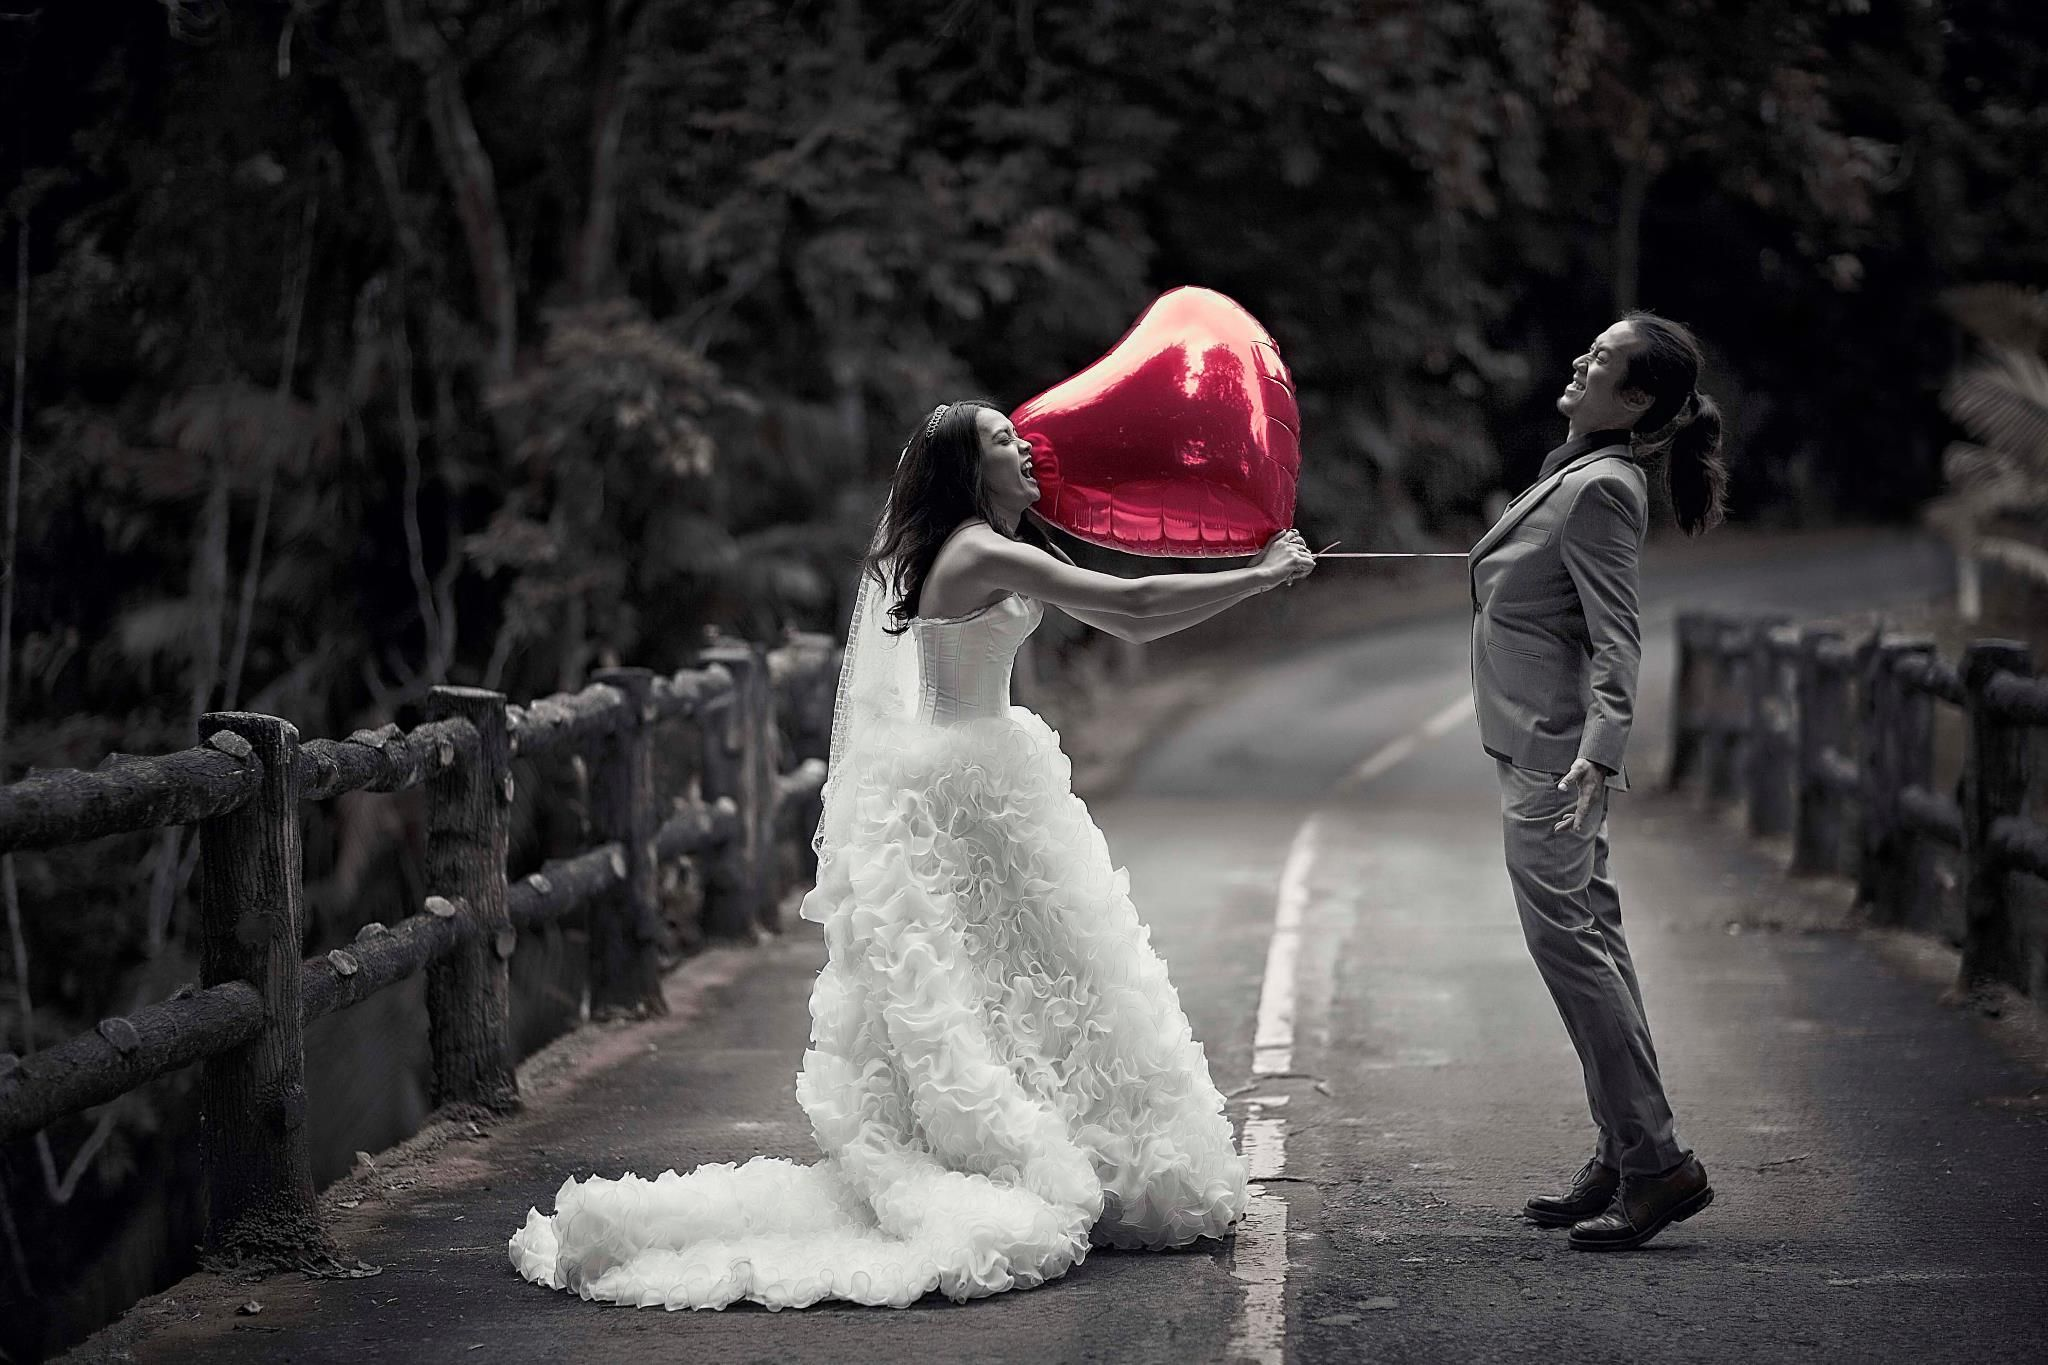 Chocoolate Facebook Pre Wedding Photoshoot Pre Wedding Photos Prewedding Photography